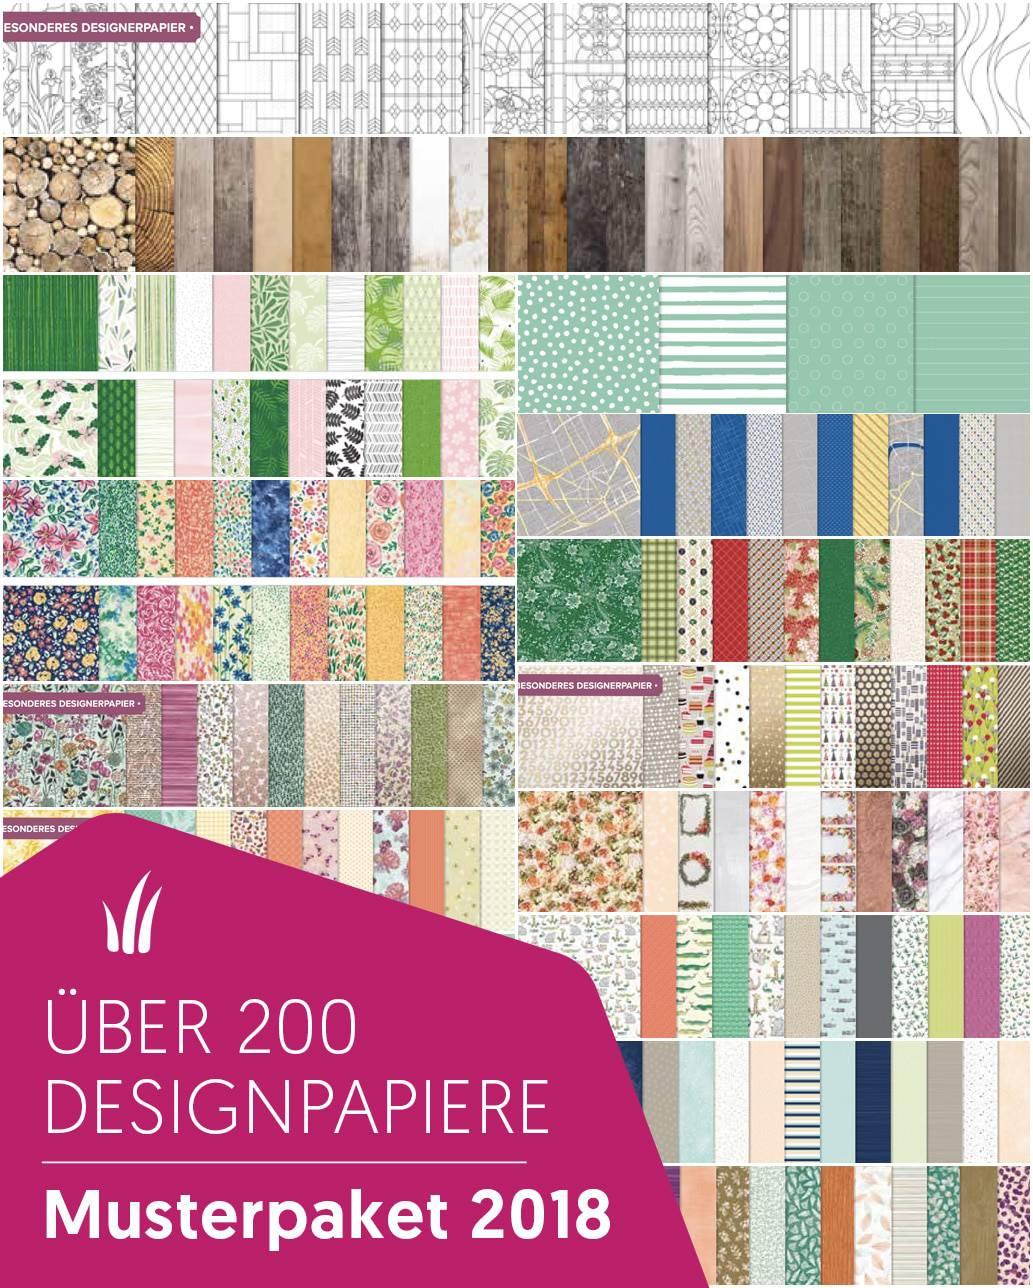 Designerpapier Share - Musterpakete 2018 1